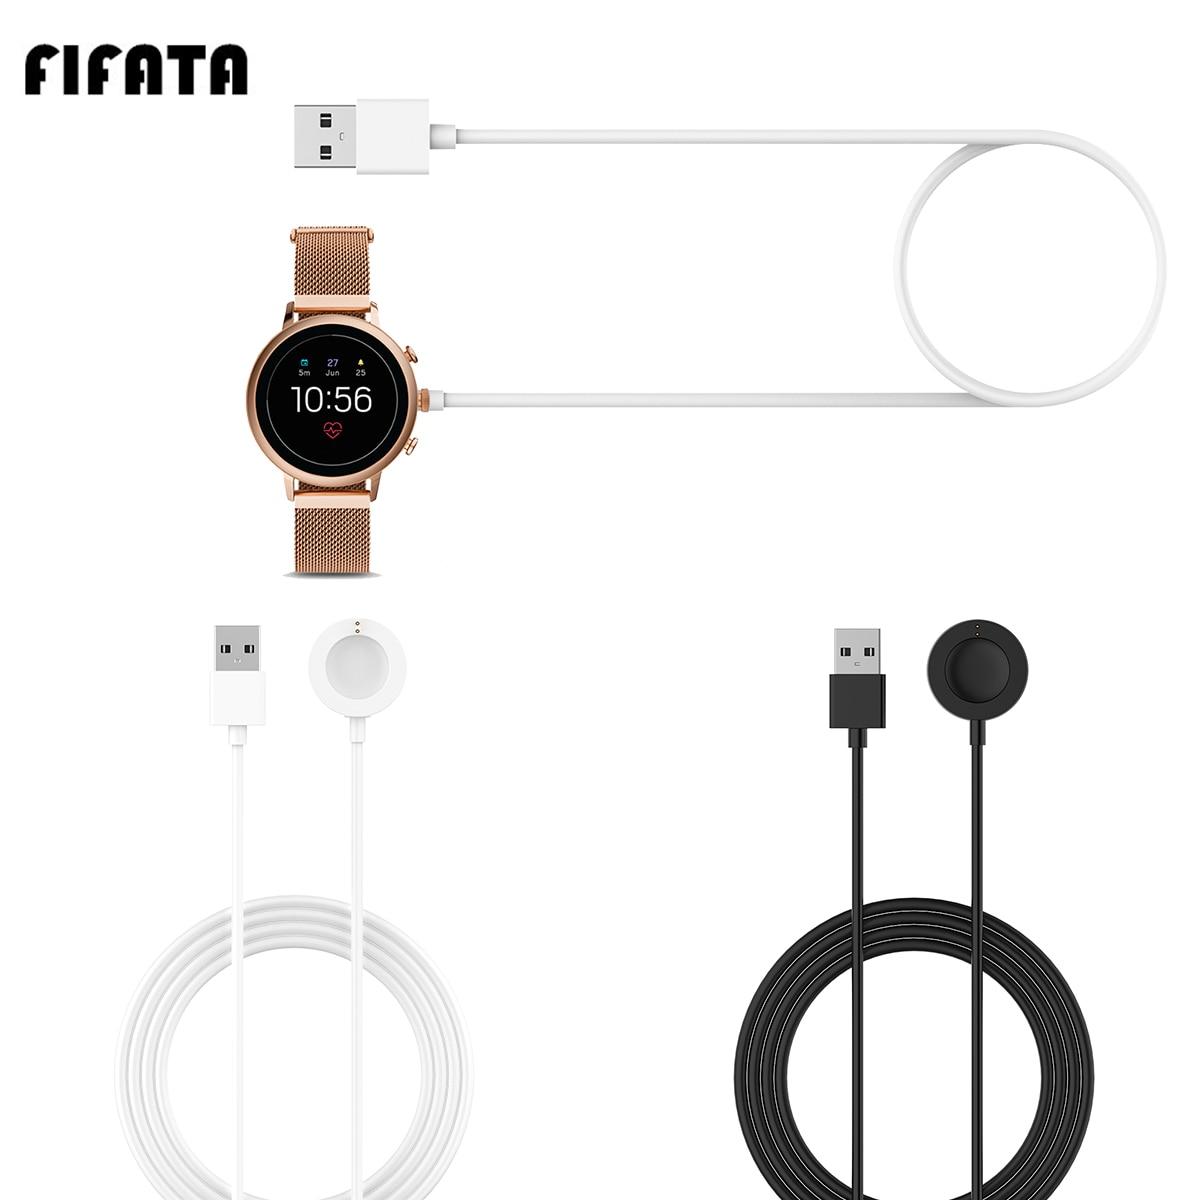 Зарядное устройство FIFATA 1 м Fossil Magnet для Fossil Gen 4/Gen 5/Emporio Армани/Skagen flaster 2/Misfit Vapor 2 Smart Watch